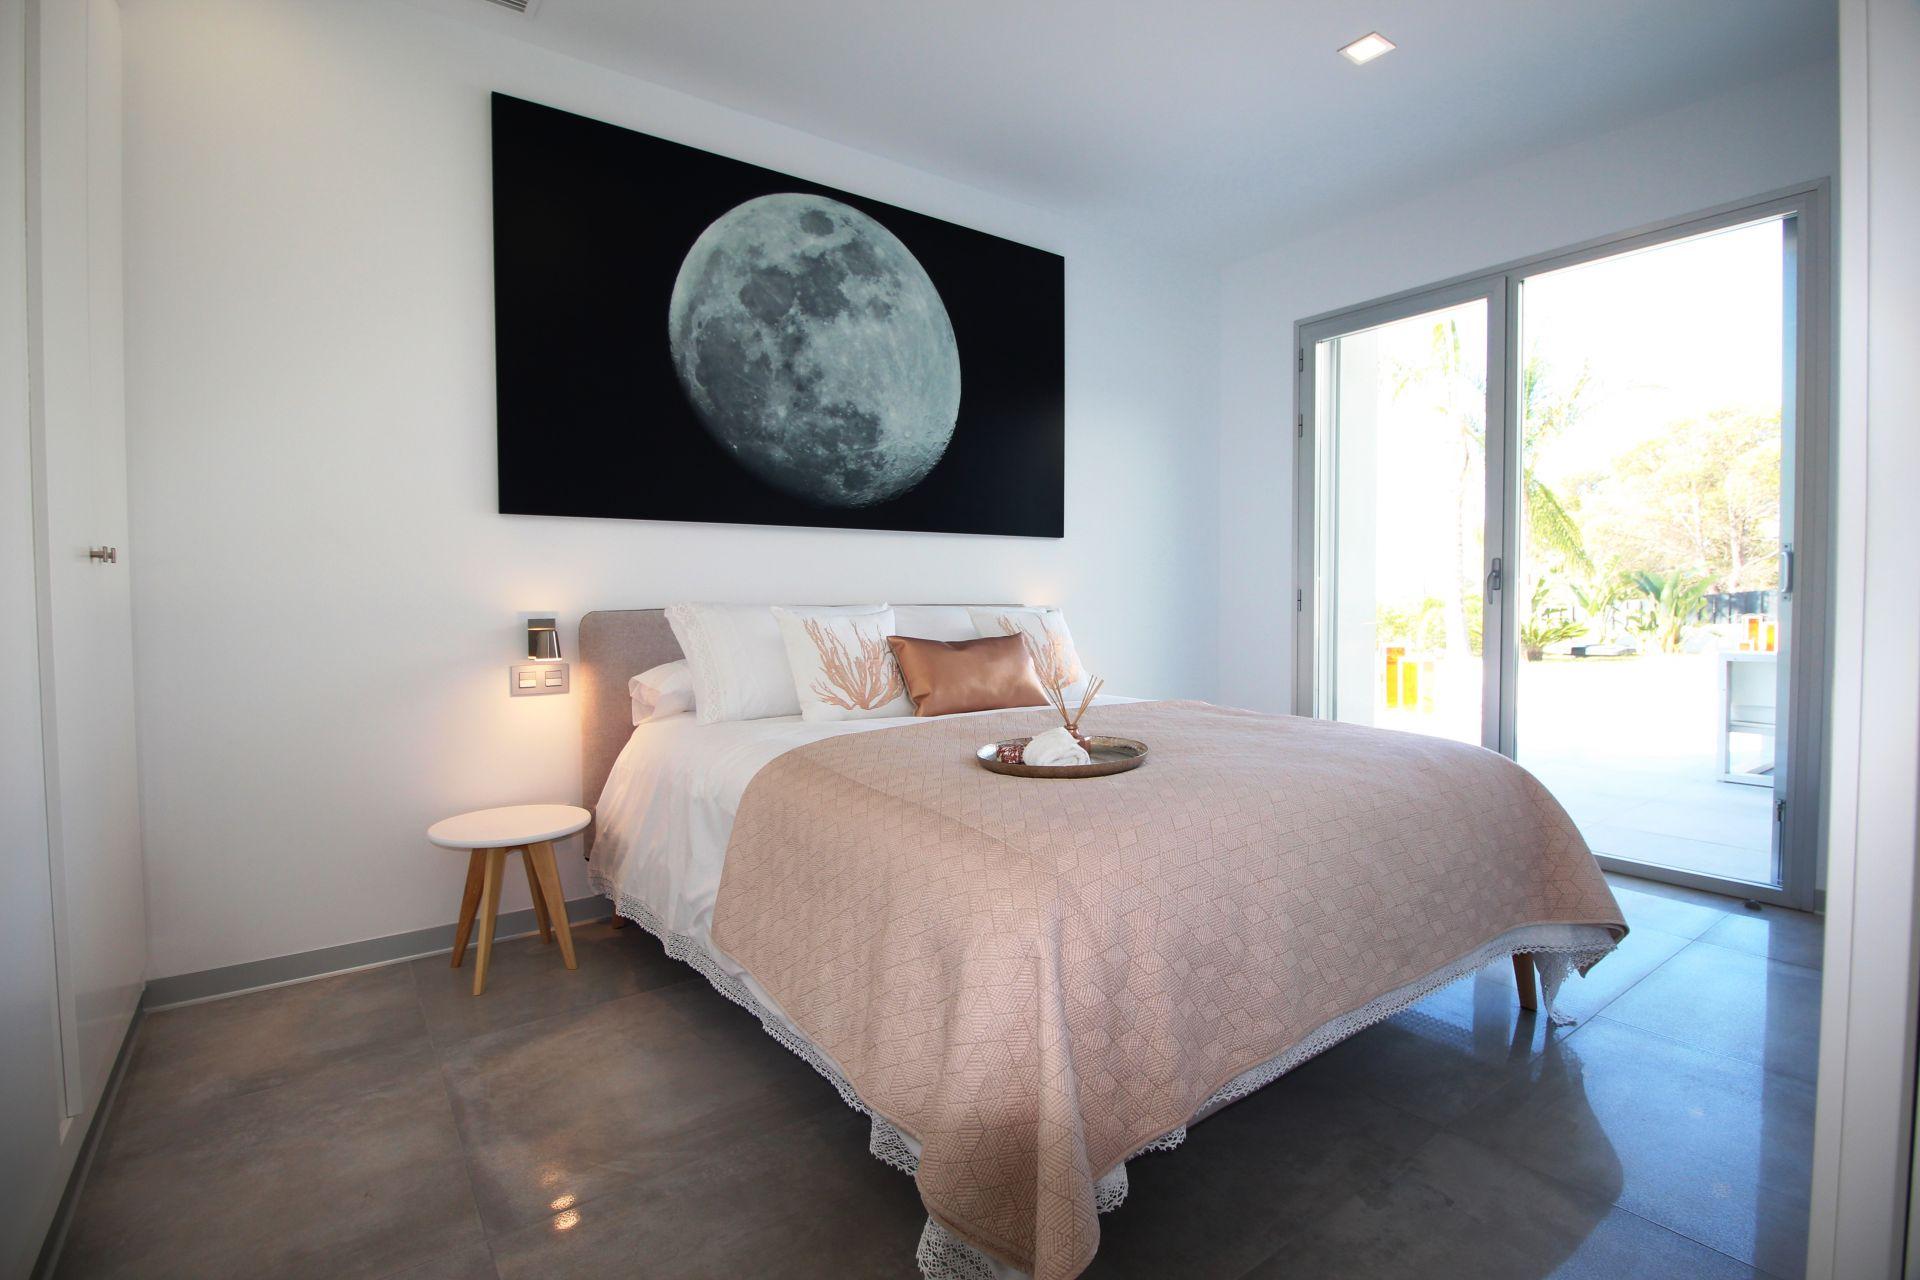 Exclusive villas with 3 bedrooms in Finestrat 3